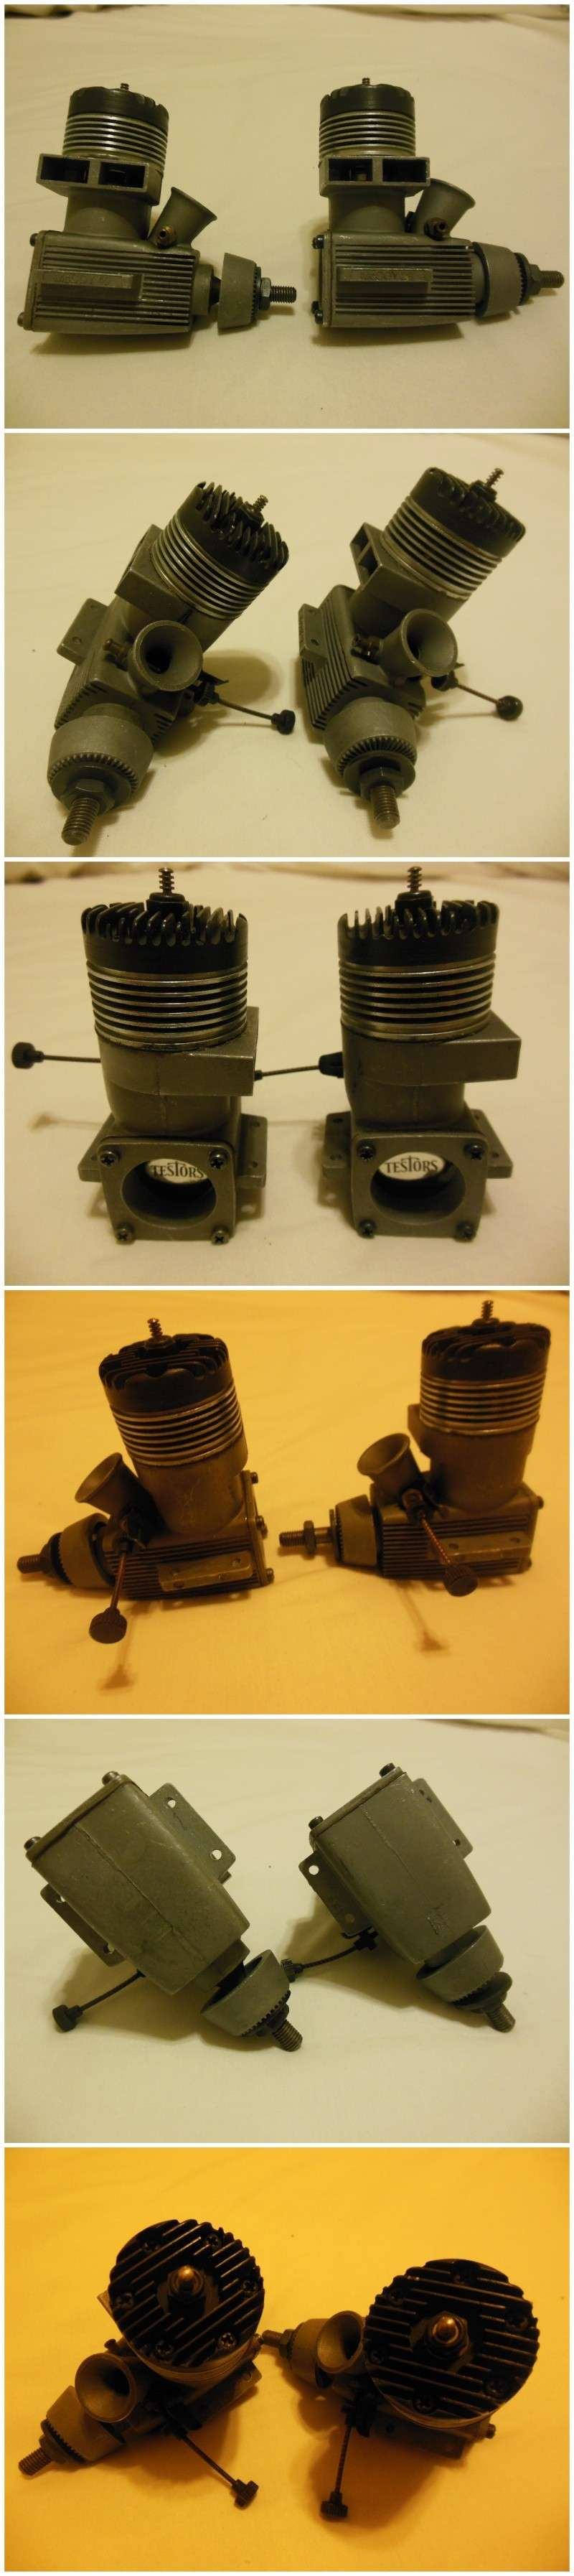 1972 Testors McCoy .29 and .40 Testor11